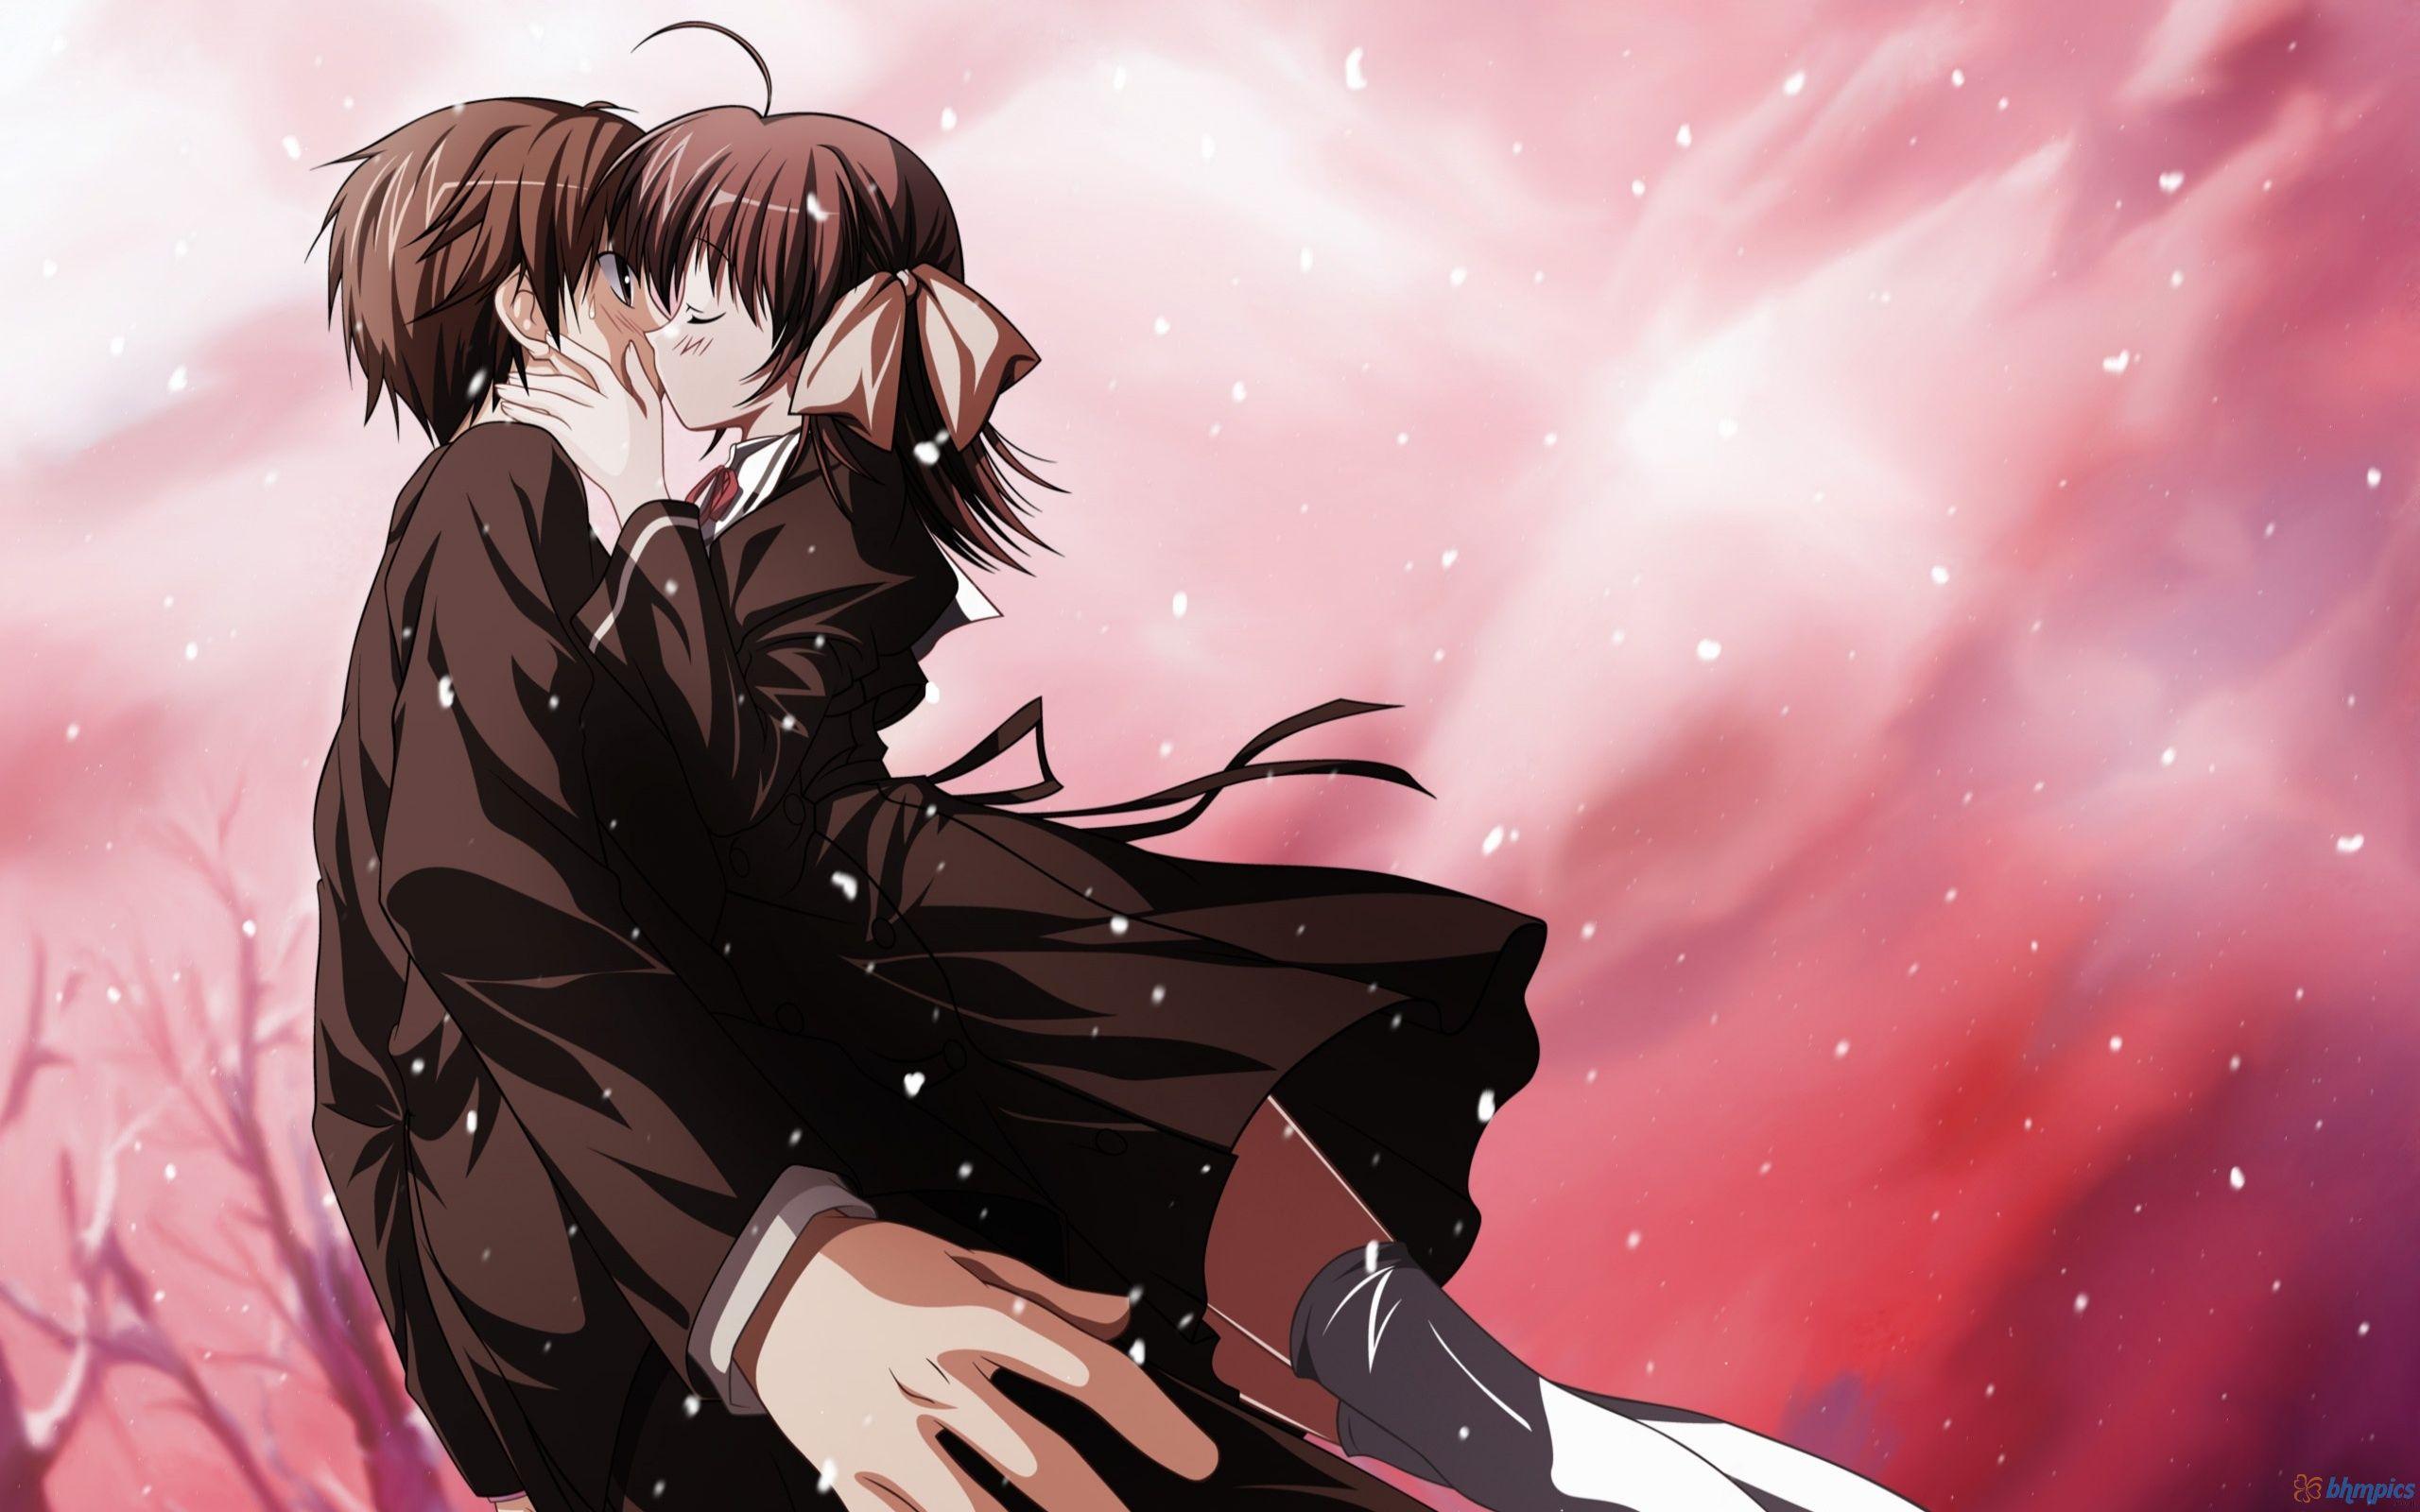 Anime Kiss Of Love Wallpapers 2560x1600 629617 Romantic Anime Anime Kiss Best Romance Anime